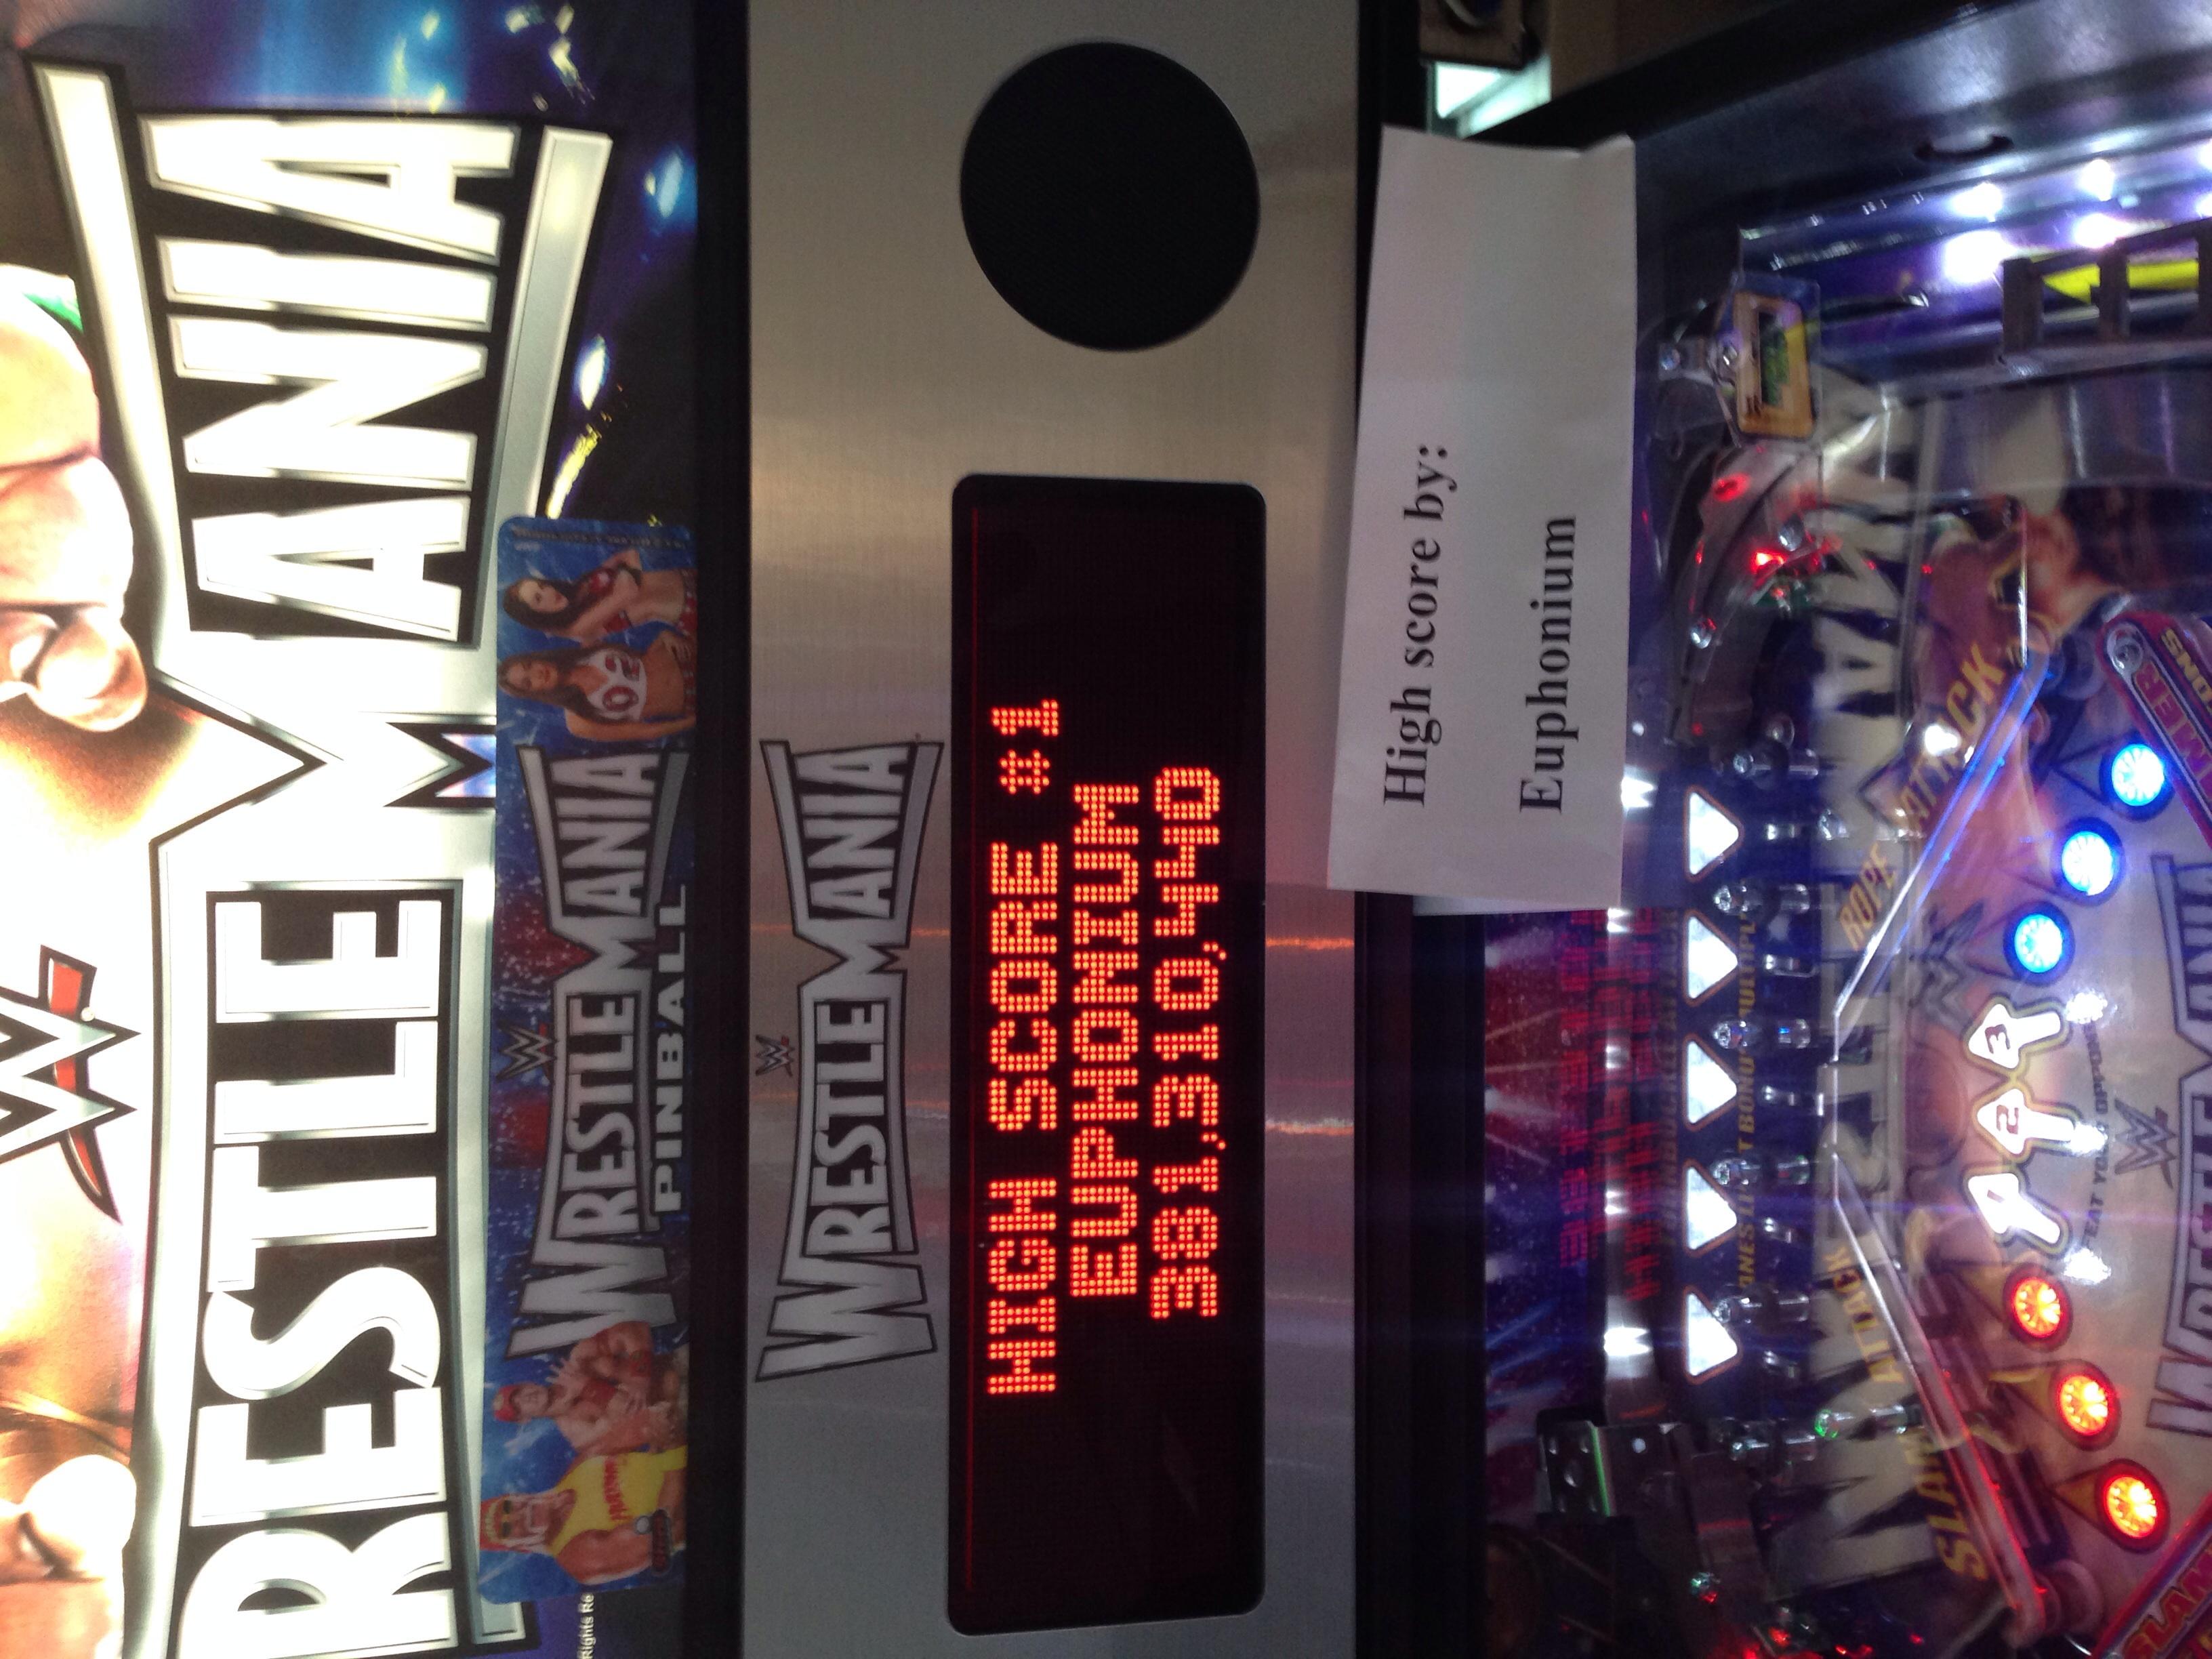 euphonium: WWE Wrestlemania (Pinball: 5 Balls) 381,310,440 points on 2016-06-26 16:15:39